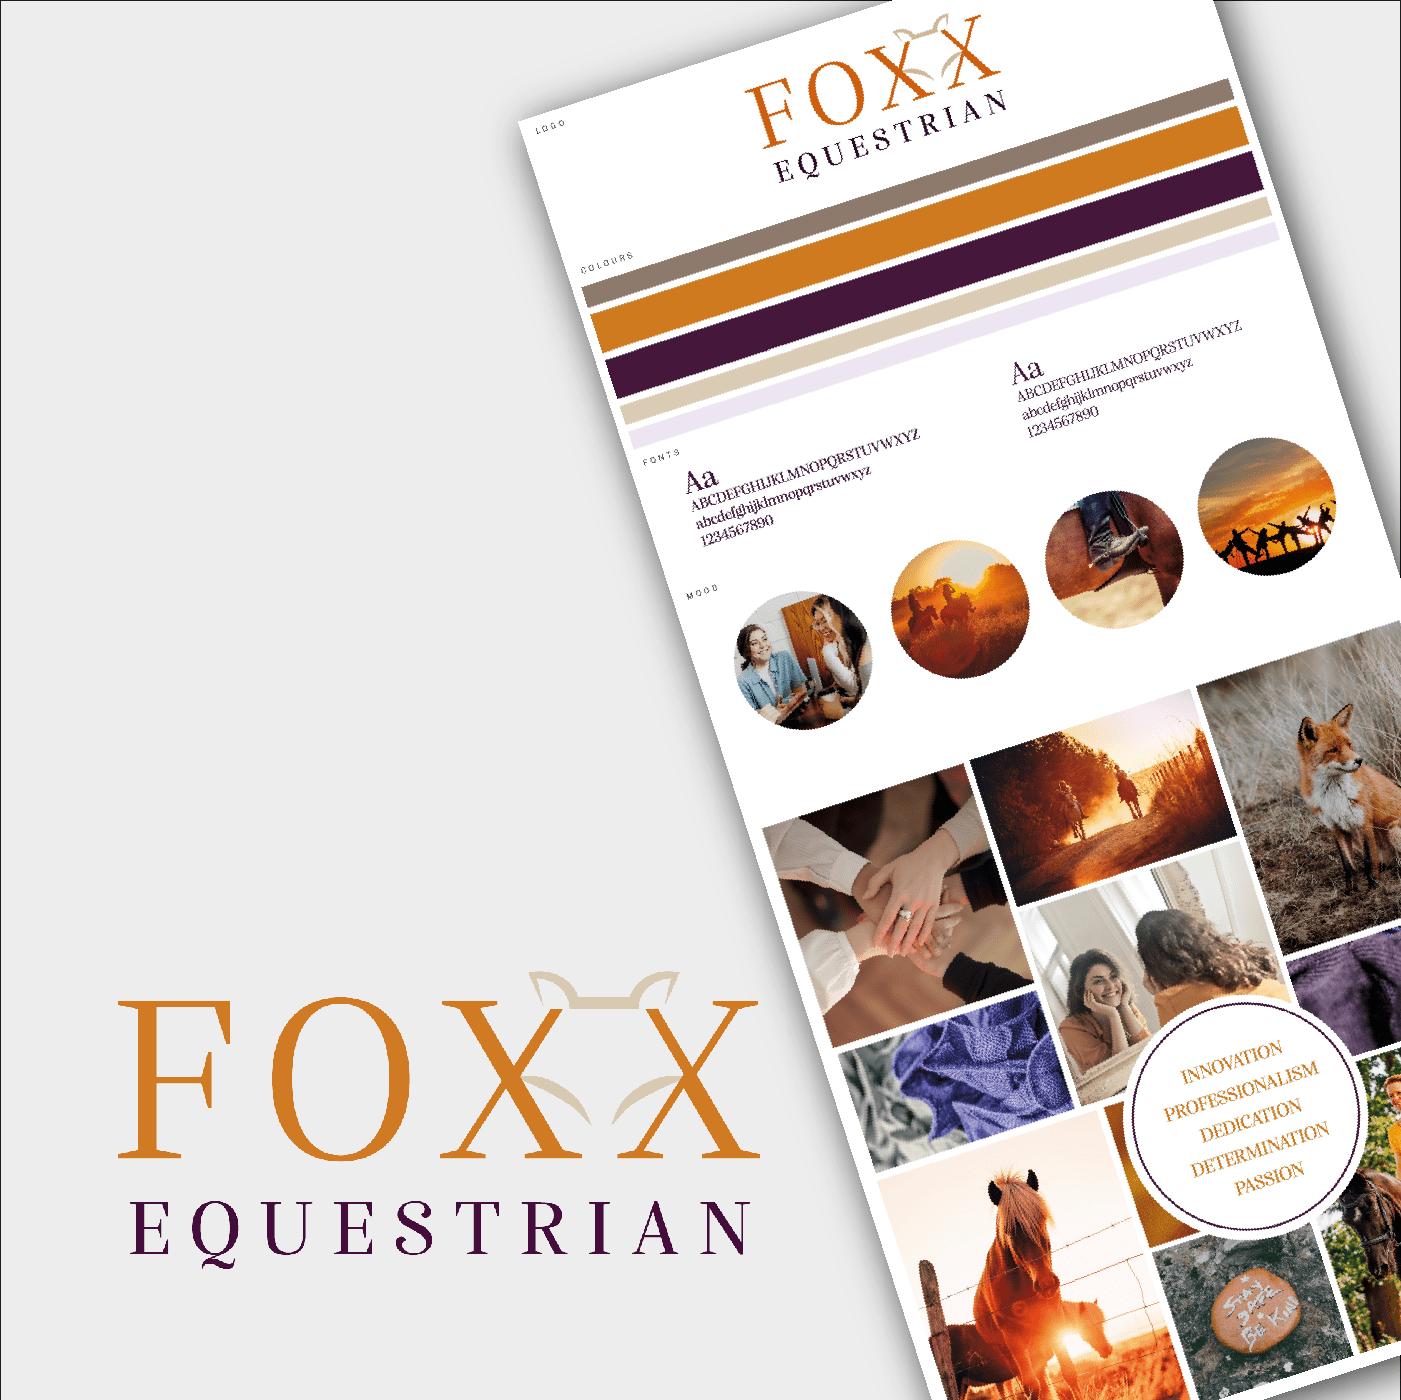 Foxx equestrian branding logo design